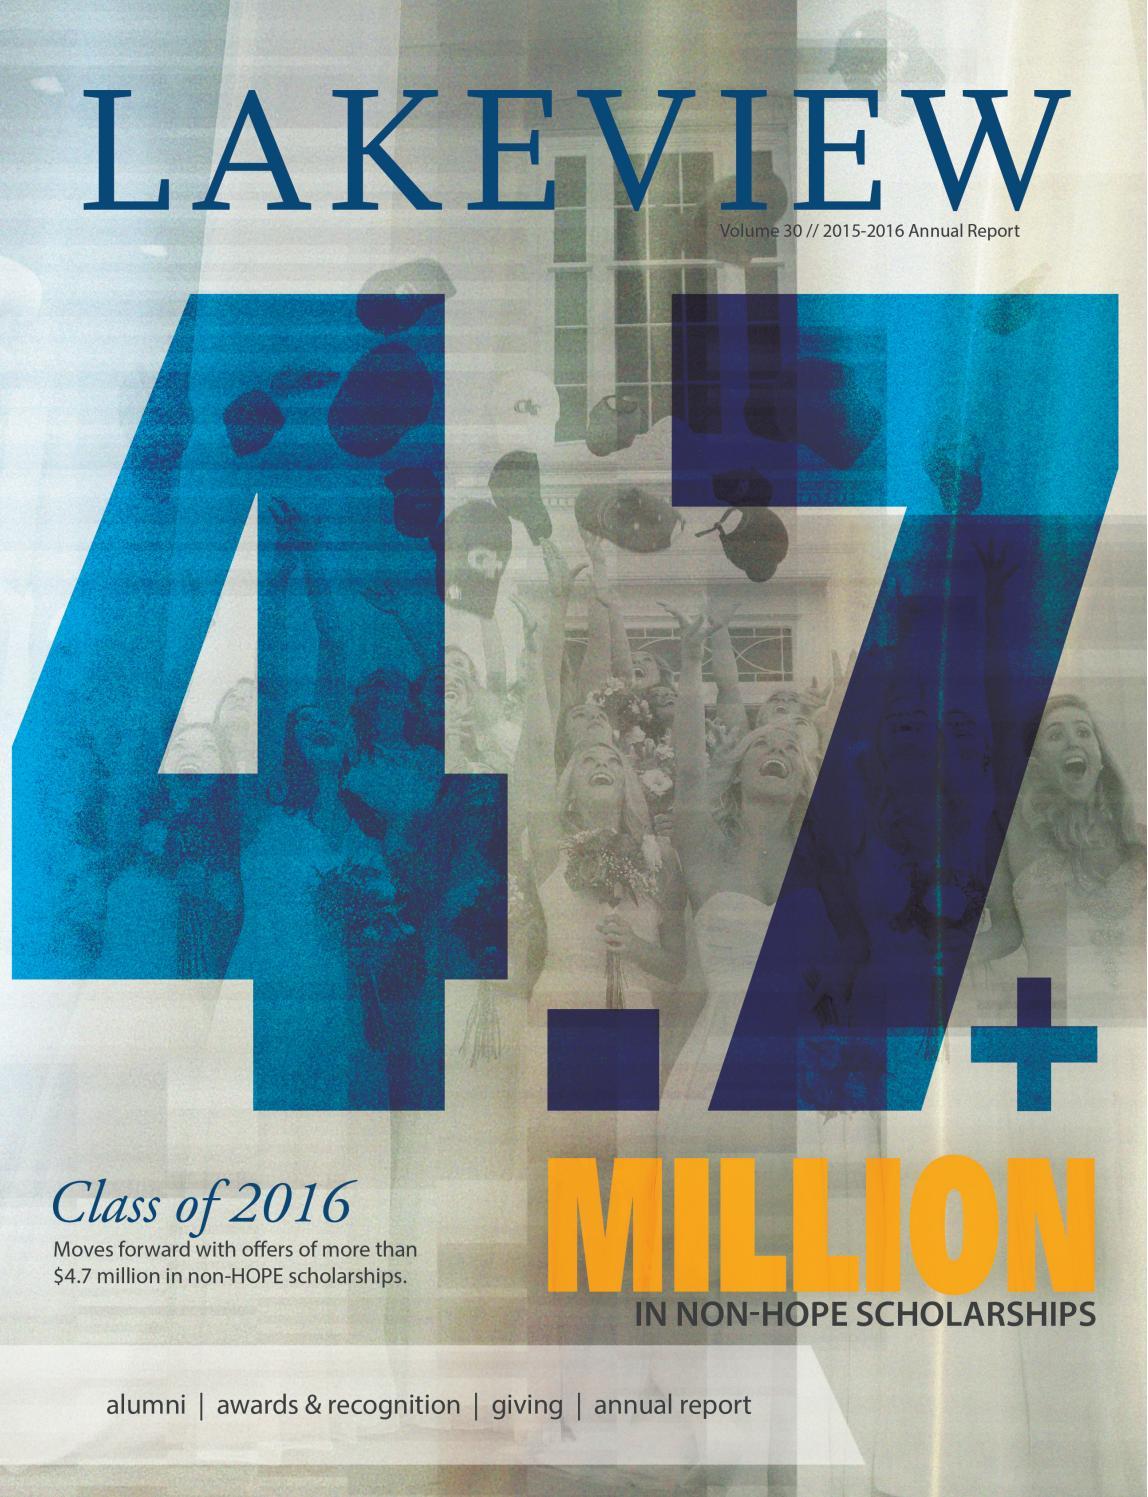 Attock refinery limited annual report 2007 chevrolet